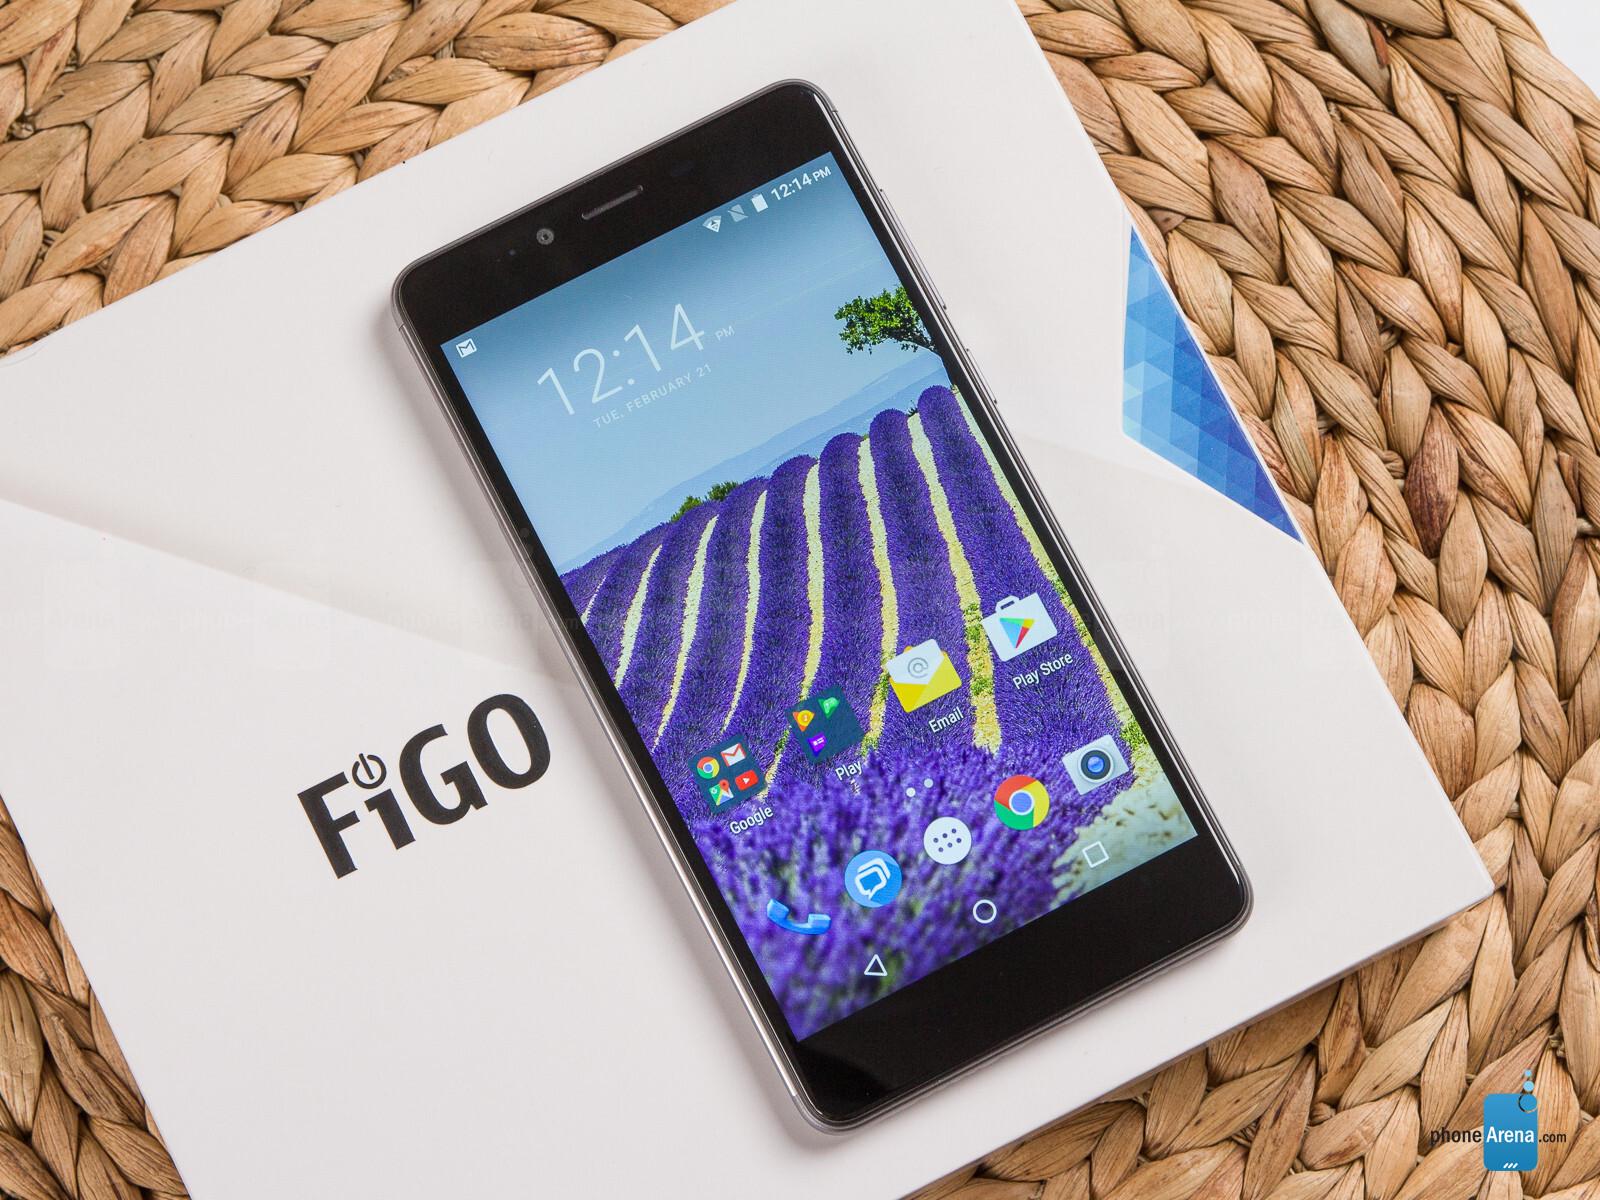 how to turn on a figo phone